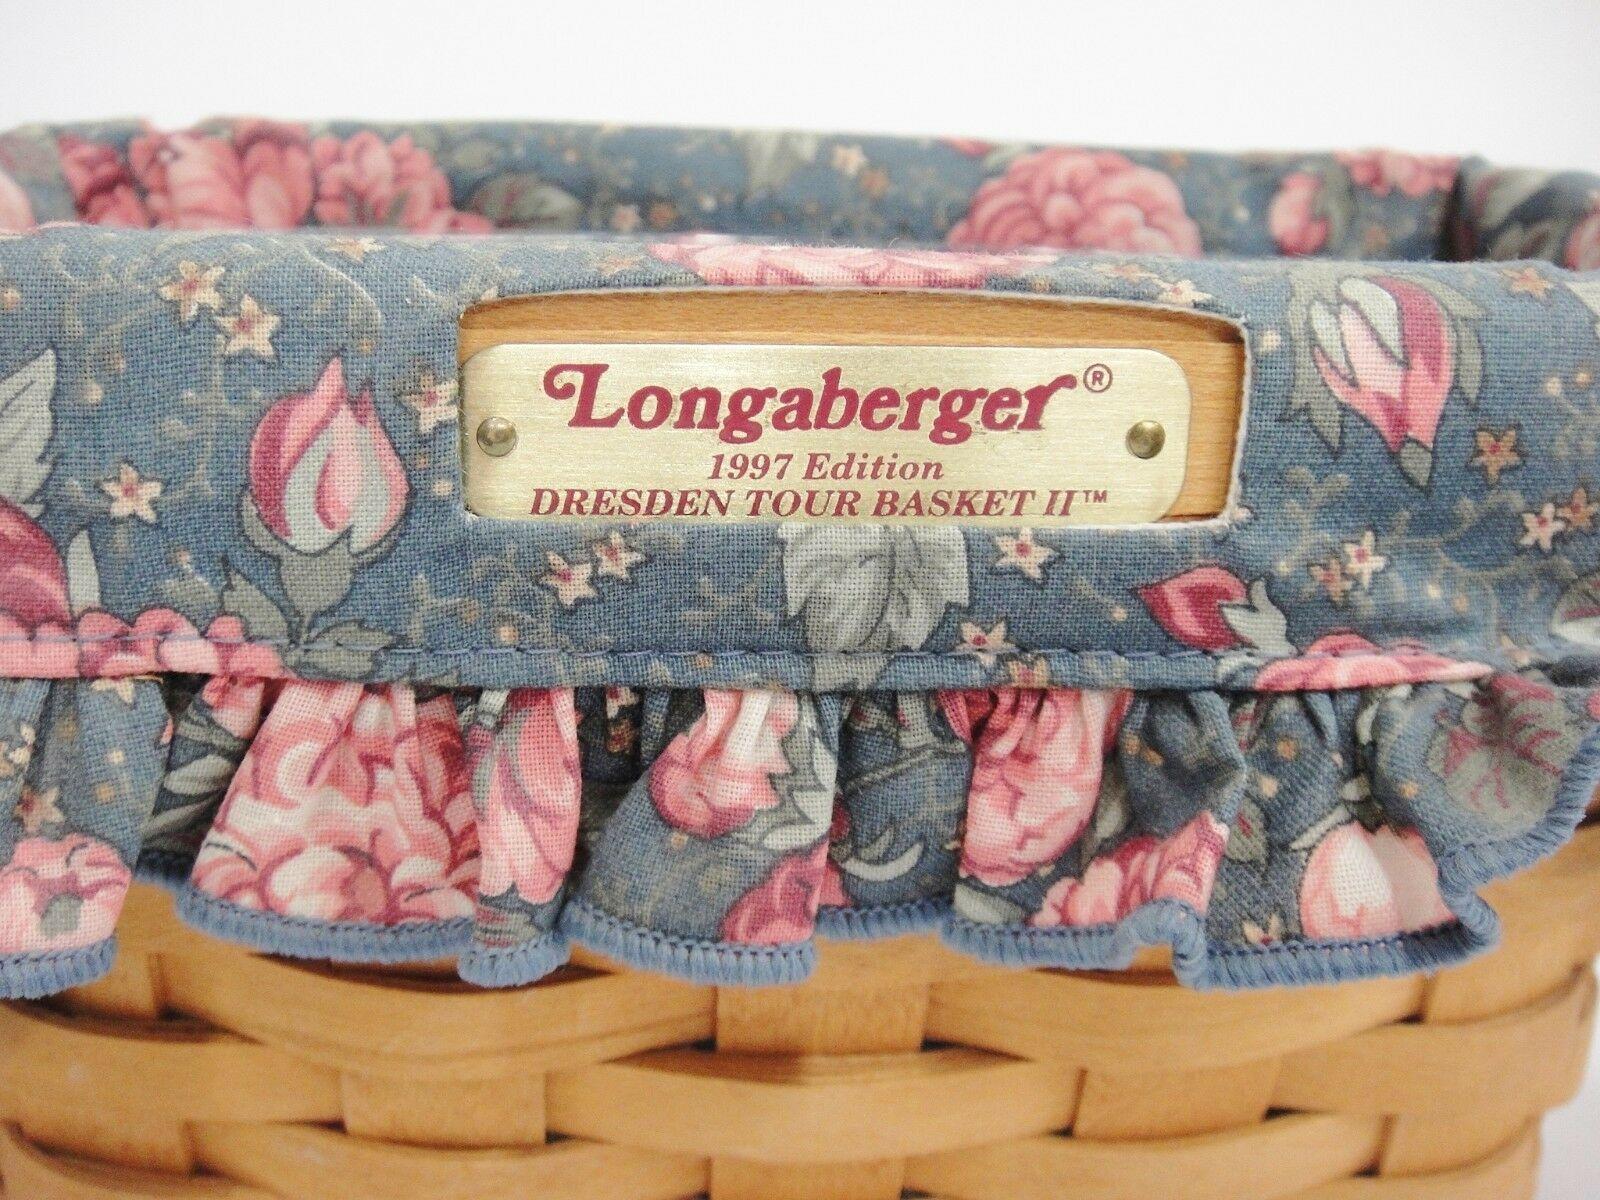 Longaberger 1997 Dresden Tour Basket II Fabric Liner & Protector 3 Signatures image 3